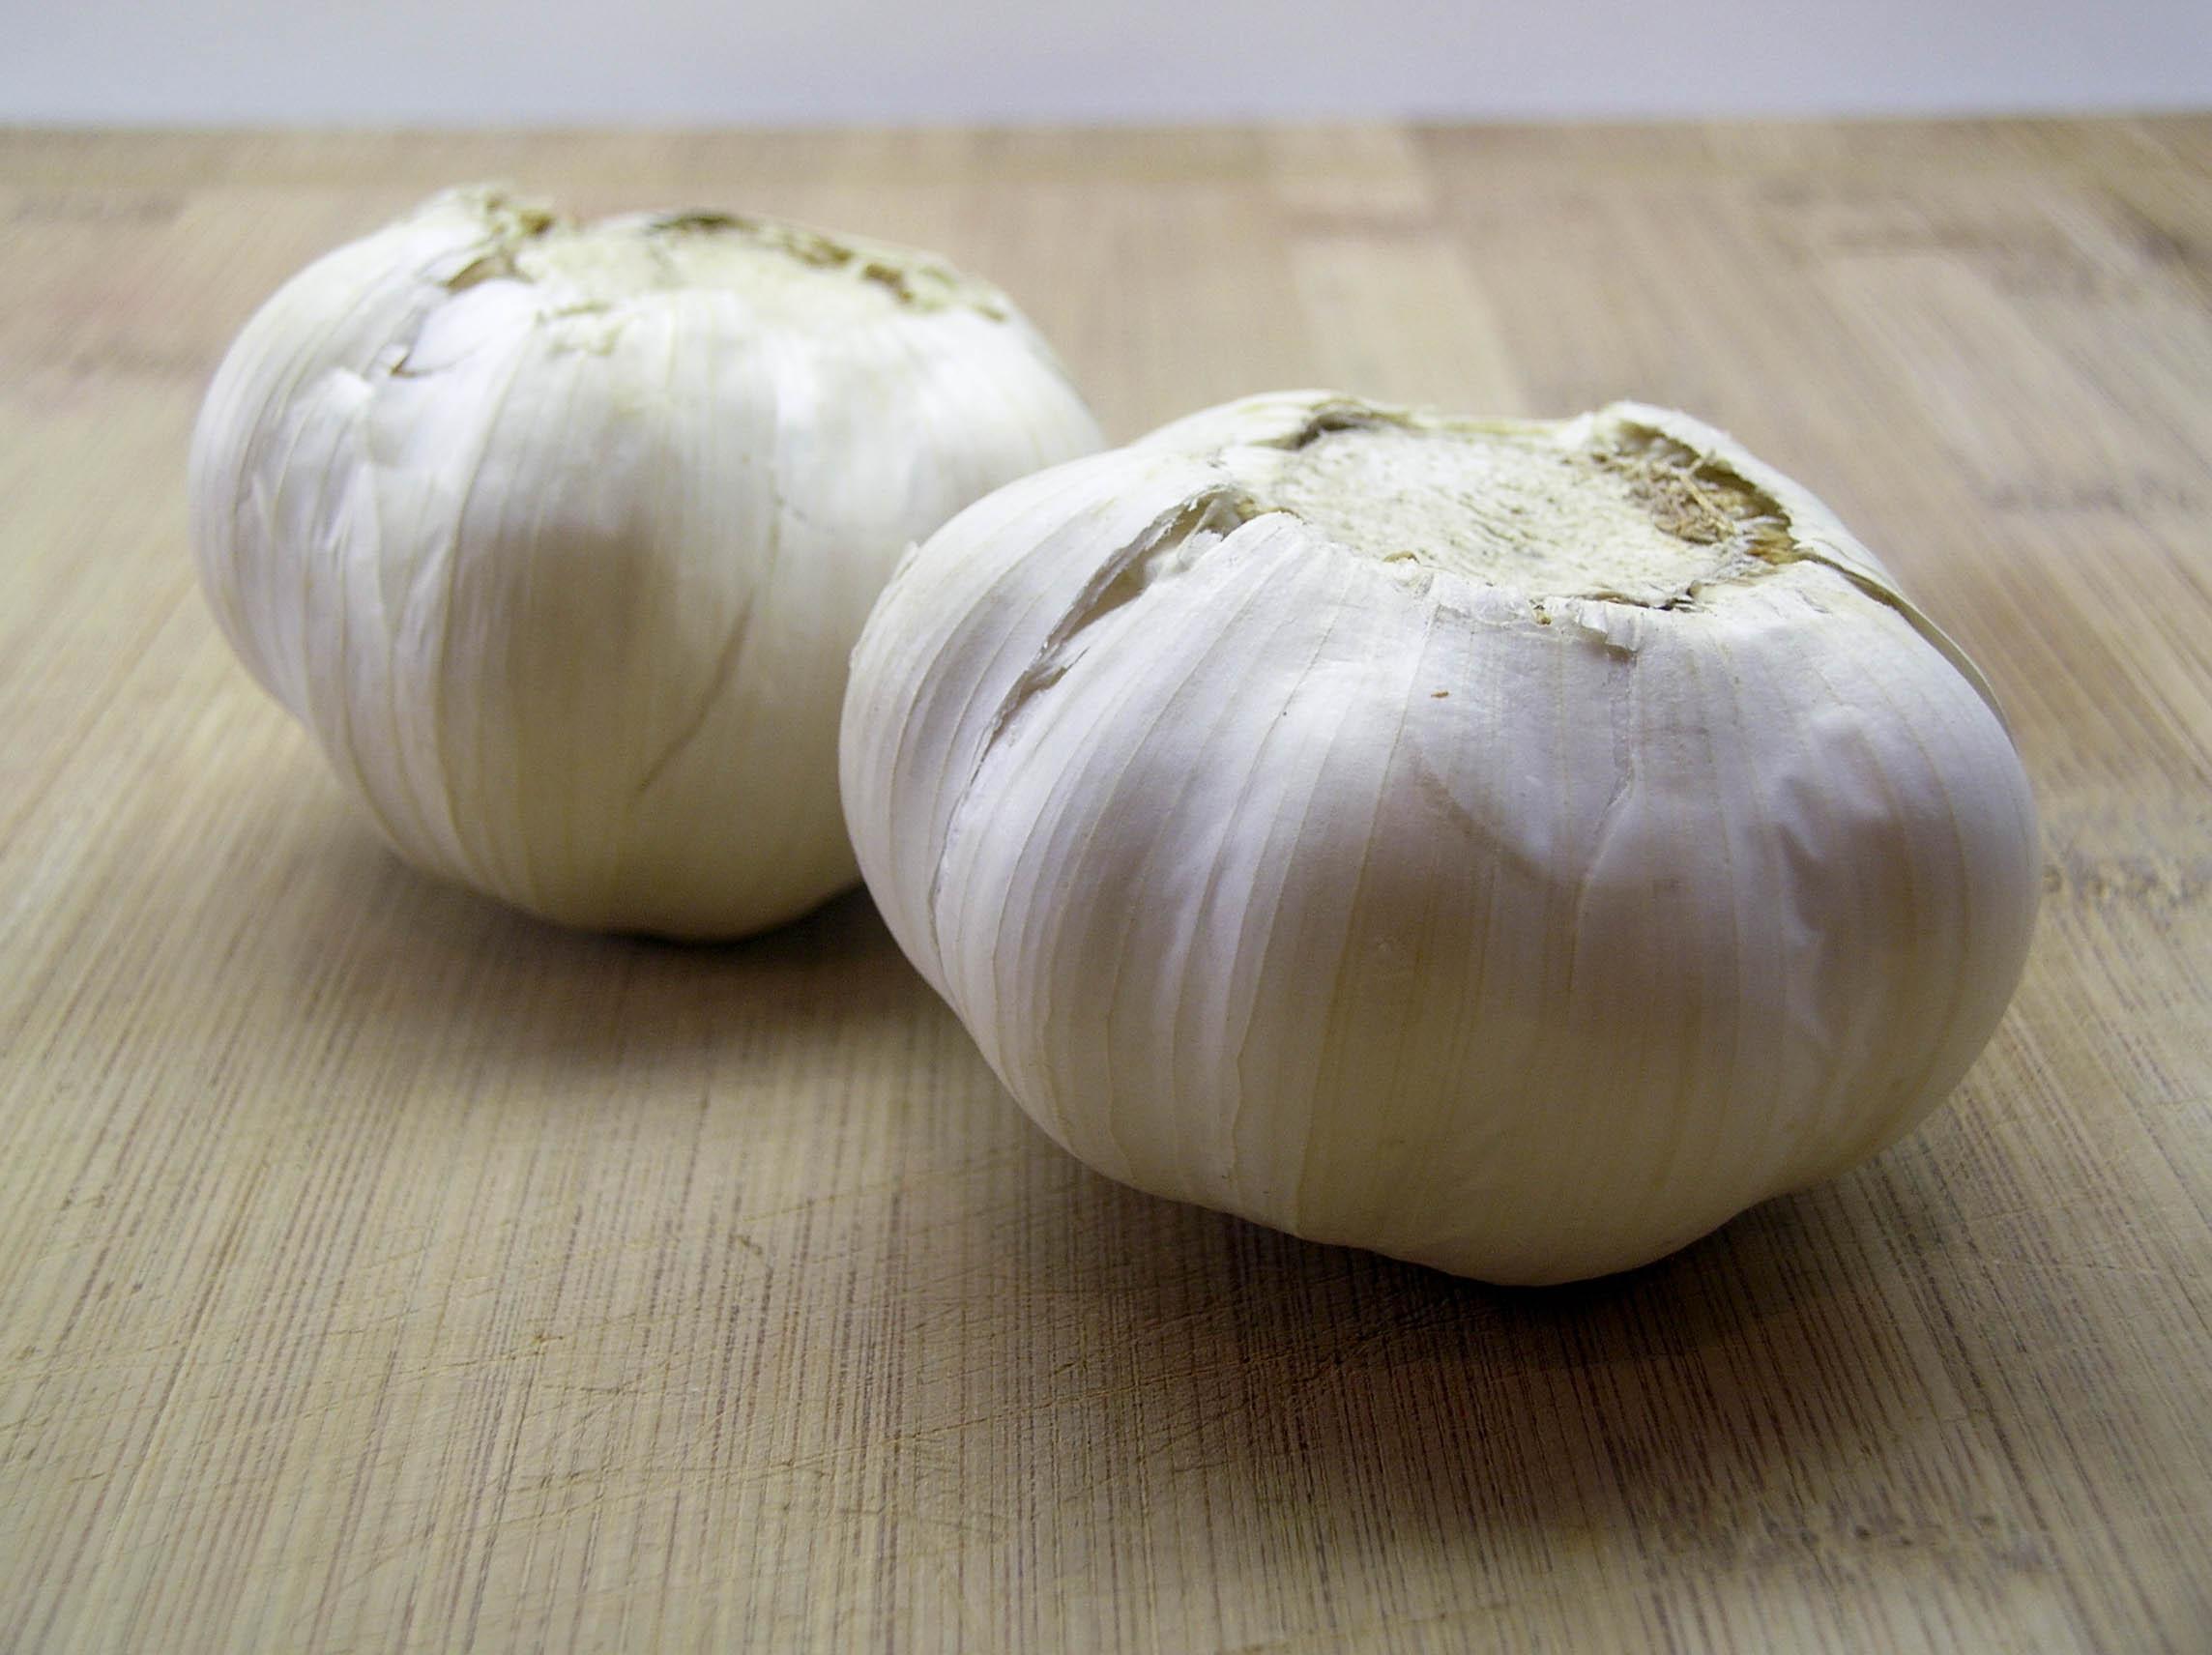 how to cut a head of garlic